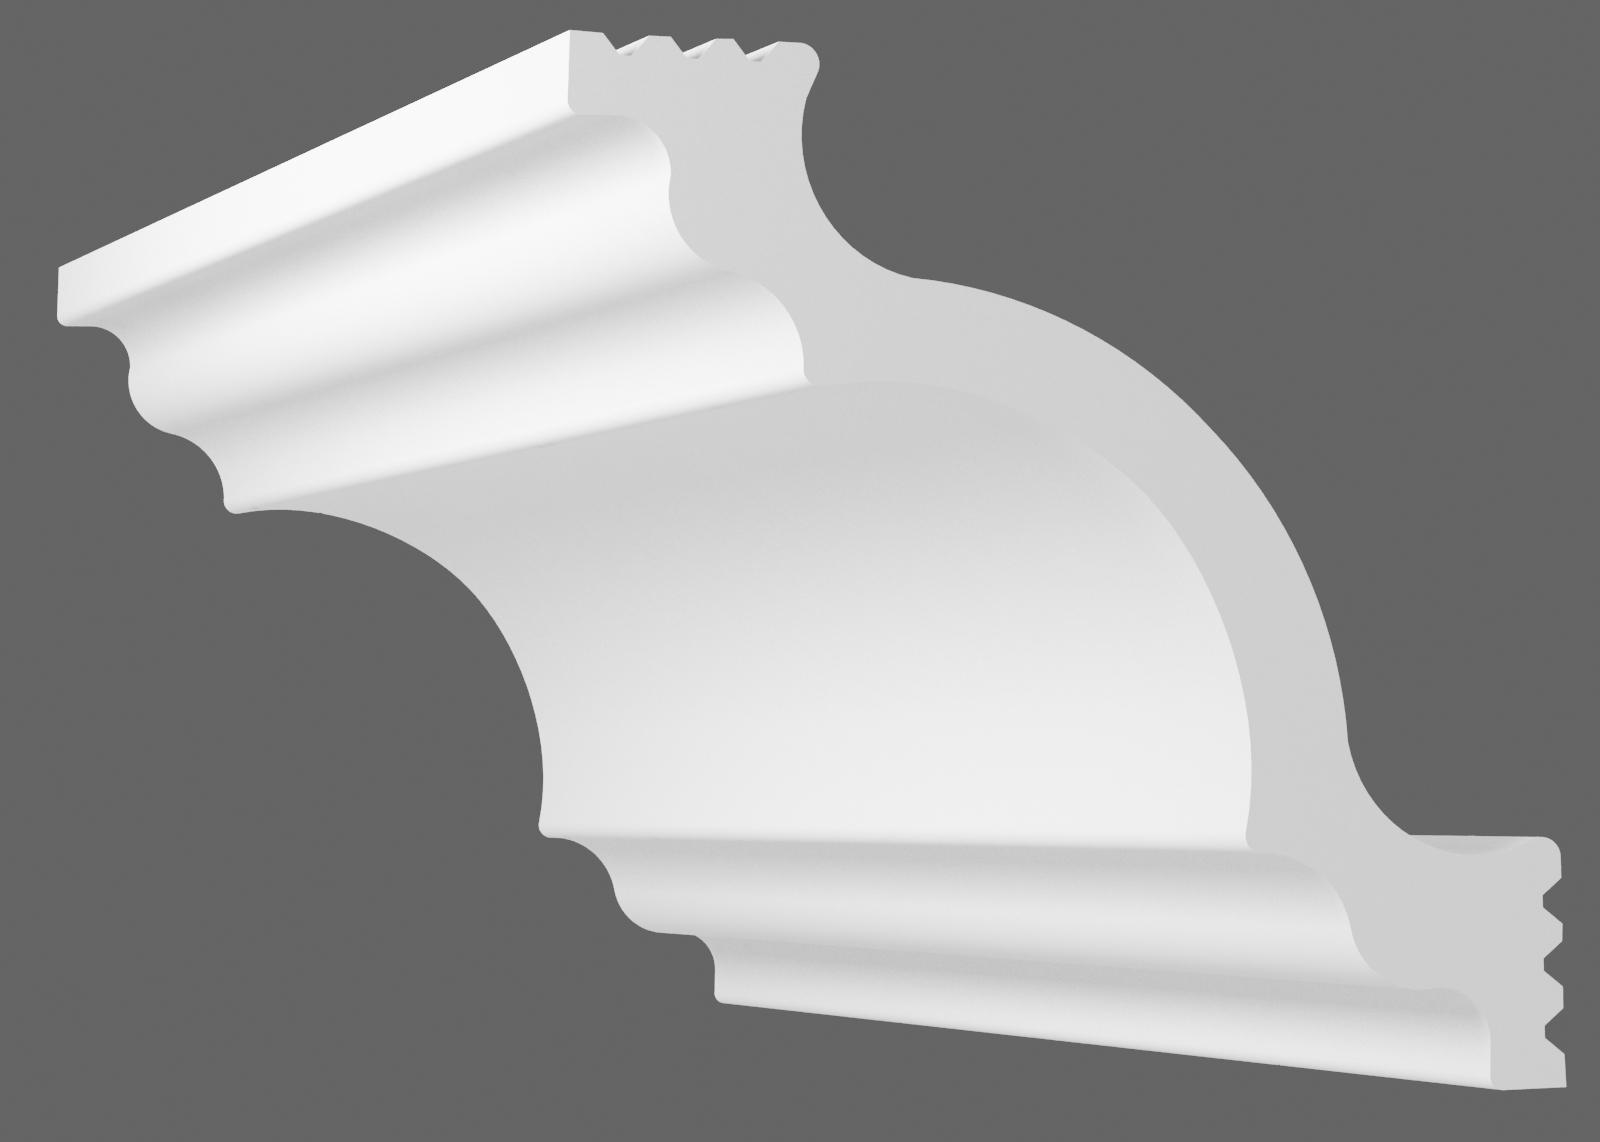 Потолочный плинтус К-120 (Размер:85х85мм)